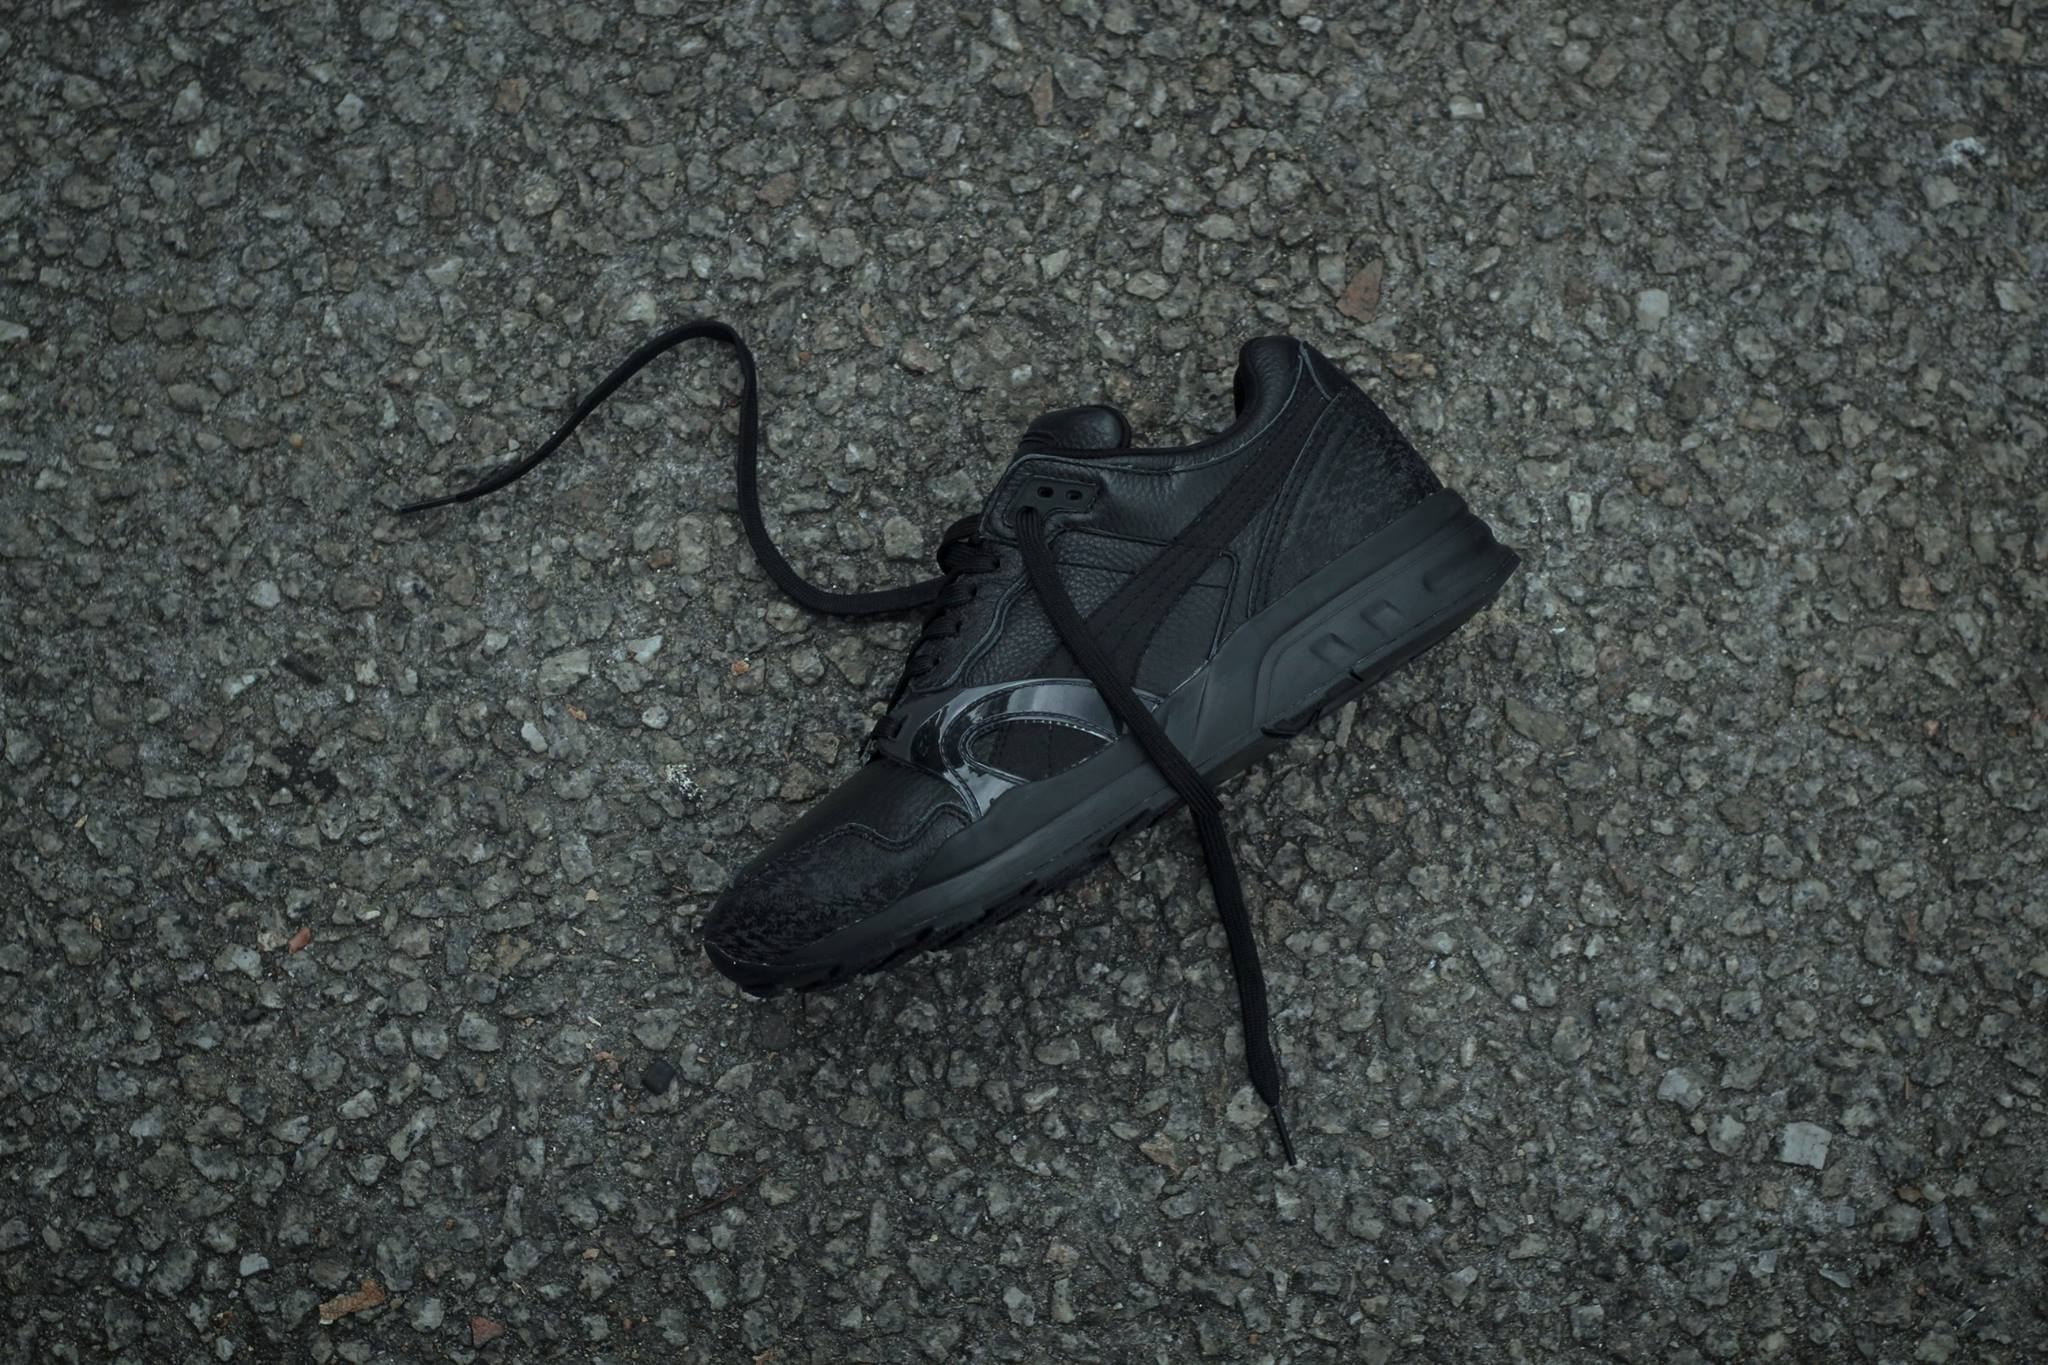 Puma Trinomic Snow Splatter Pack Triple Black Adidas Yeezy Ultraviolet Release Date